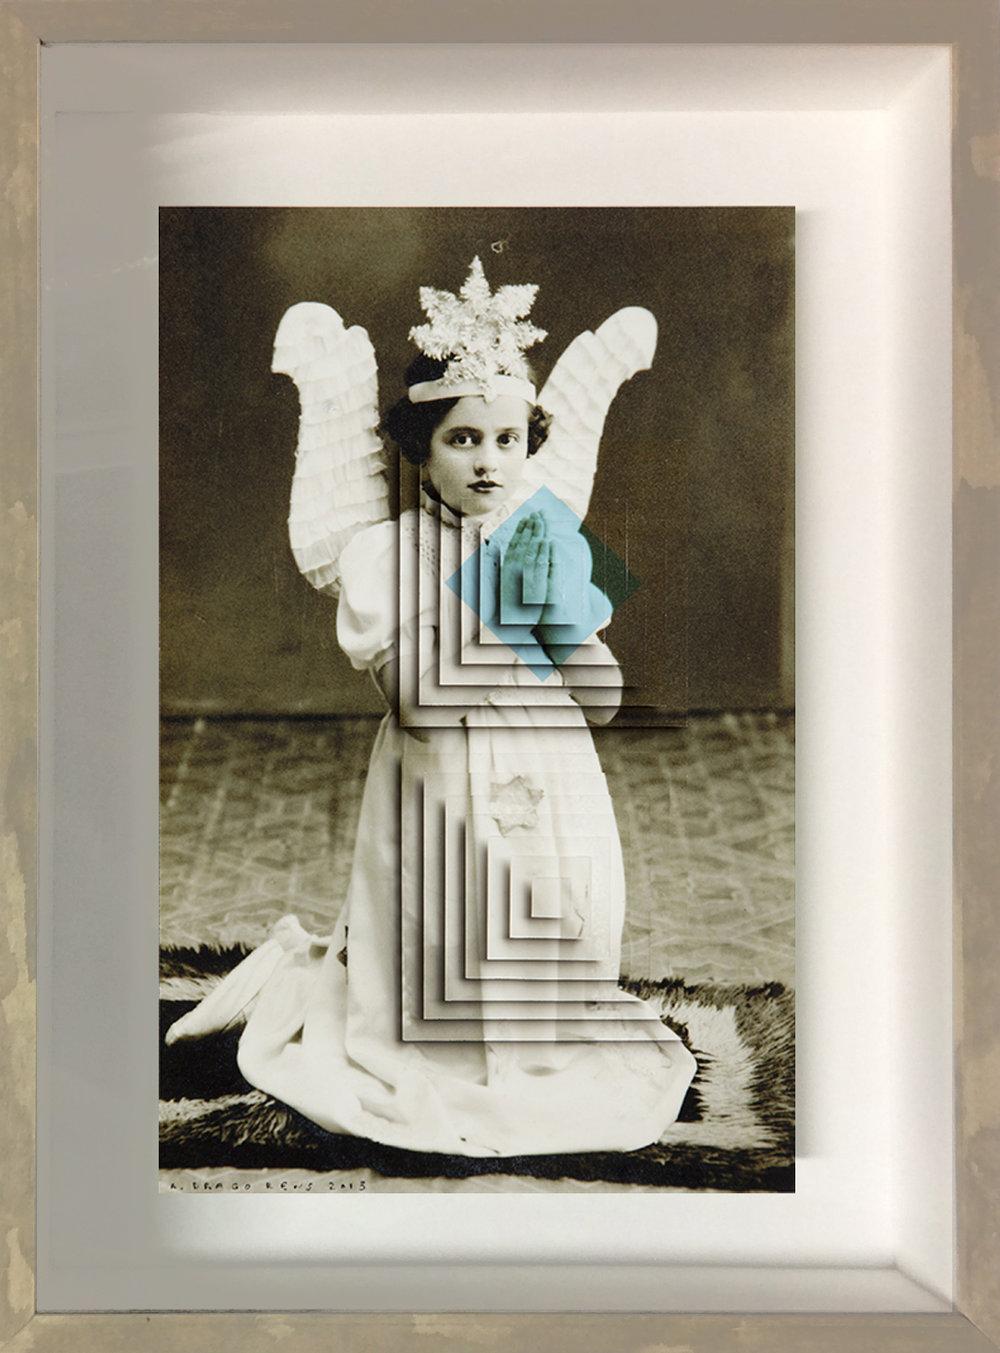 41. Galleria-l'Affiche_Alfred-Drago-Rens_Angioletto-bulgaro#3_2013_31,3x22,8cm.jpg.jpg